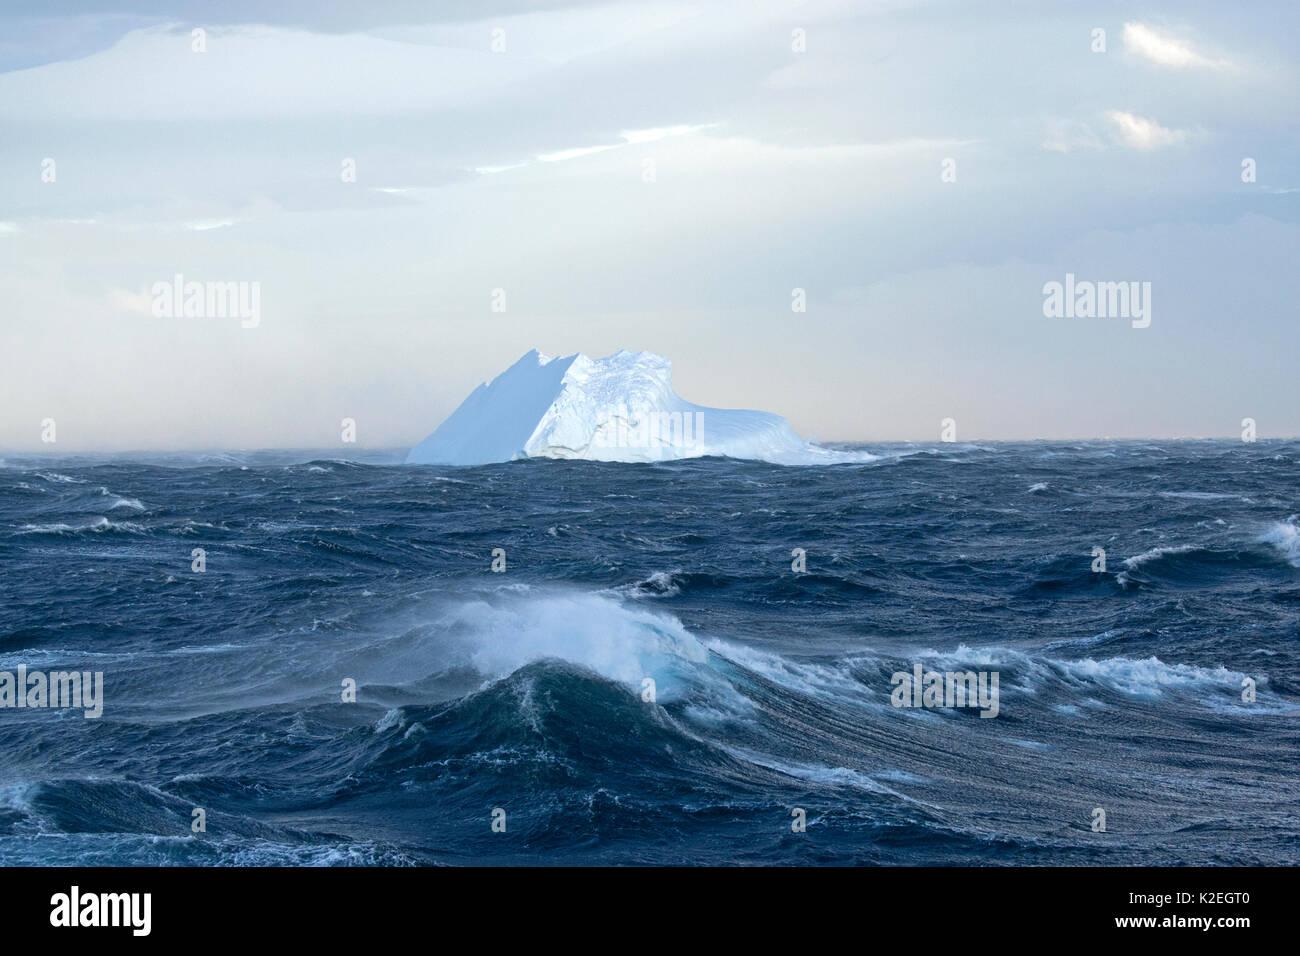 Iceberg in rough seas, Bransfield Strait, Antarctic Peninsula, Antarctica. December 2015. Stock Photo